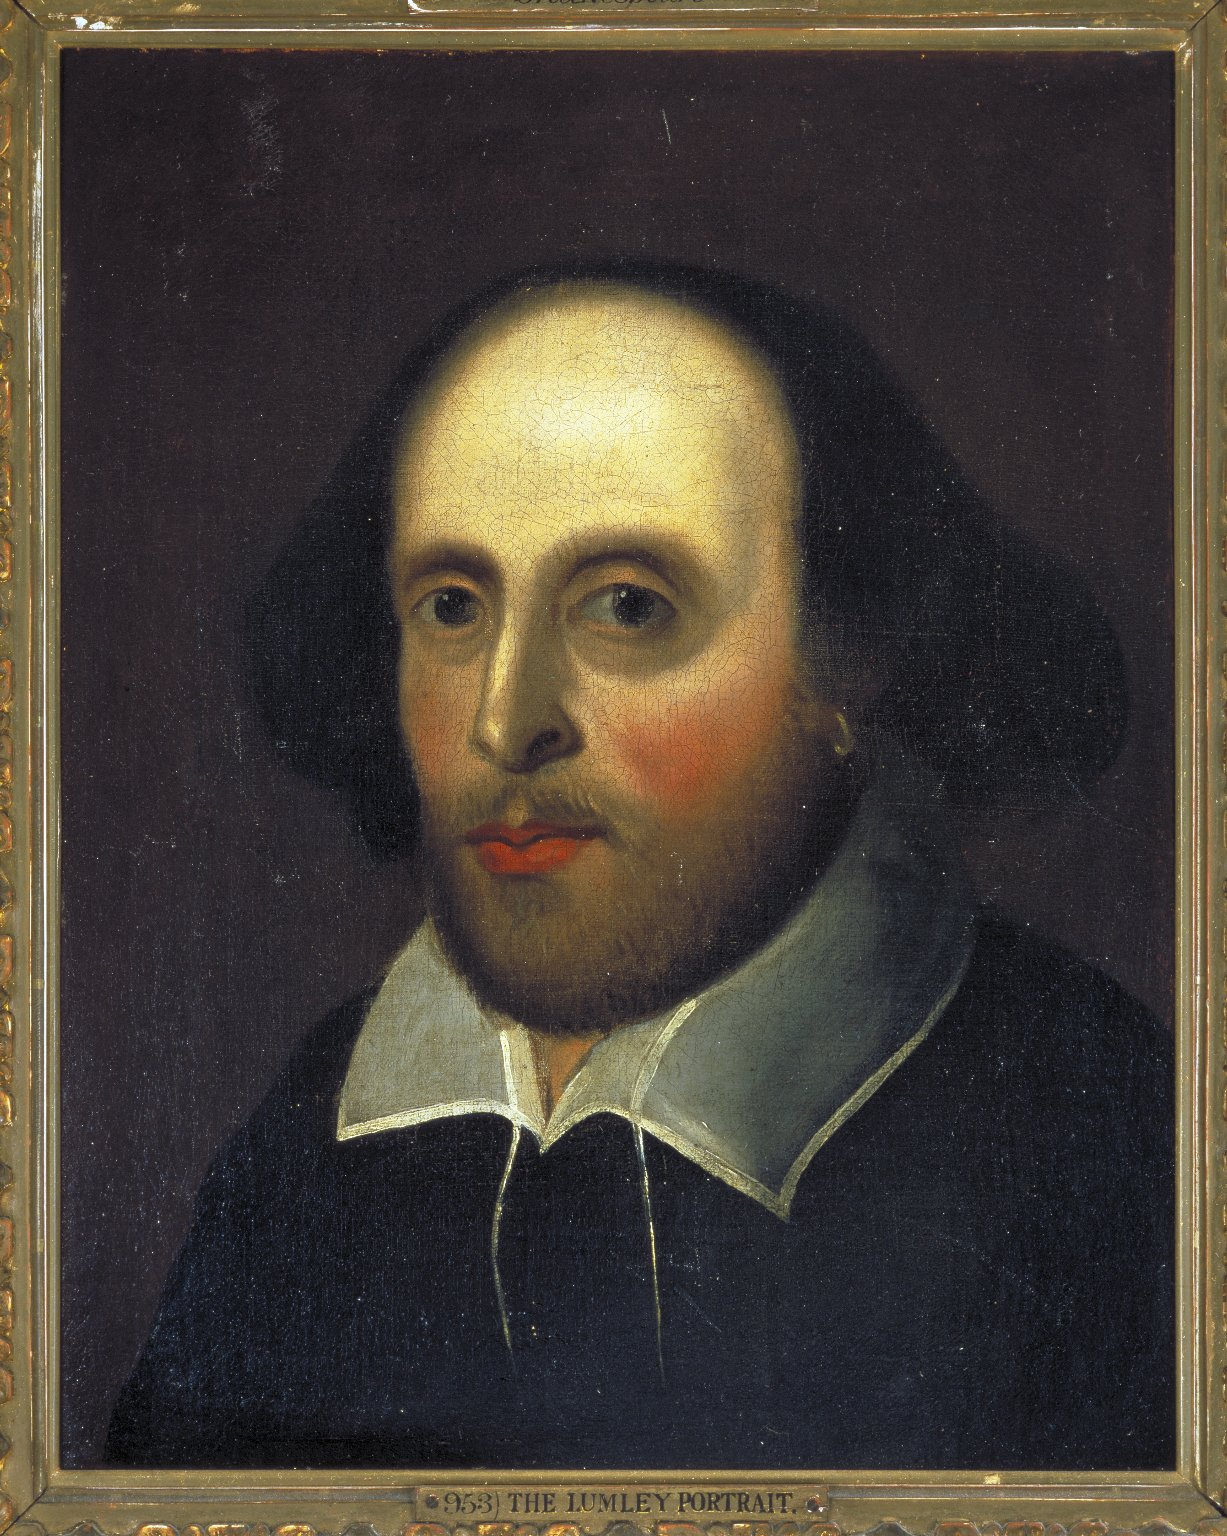 Lumley Portrait of Shakespeare